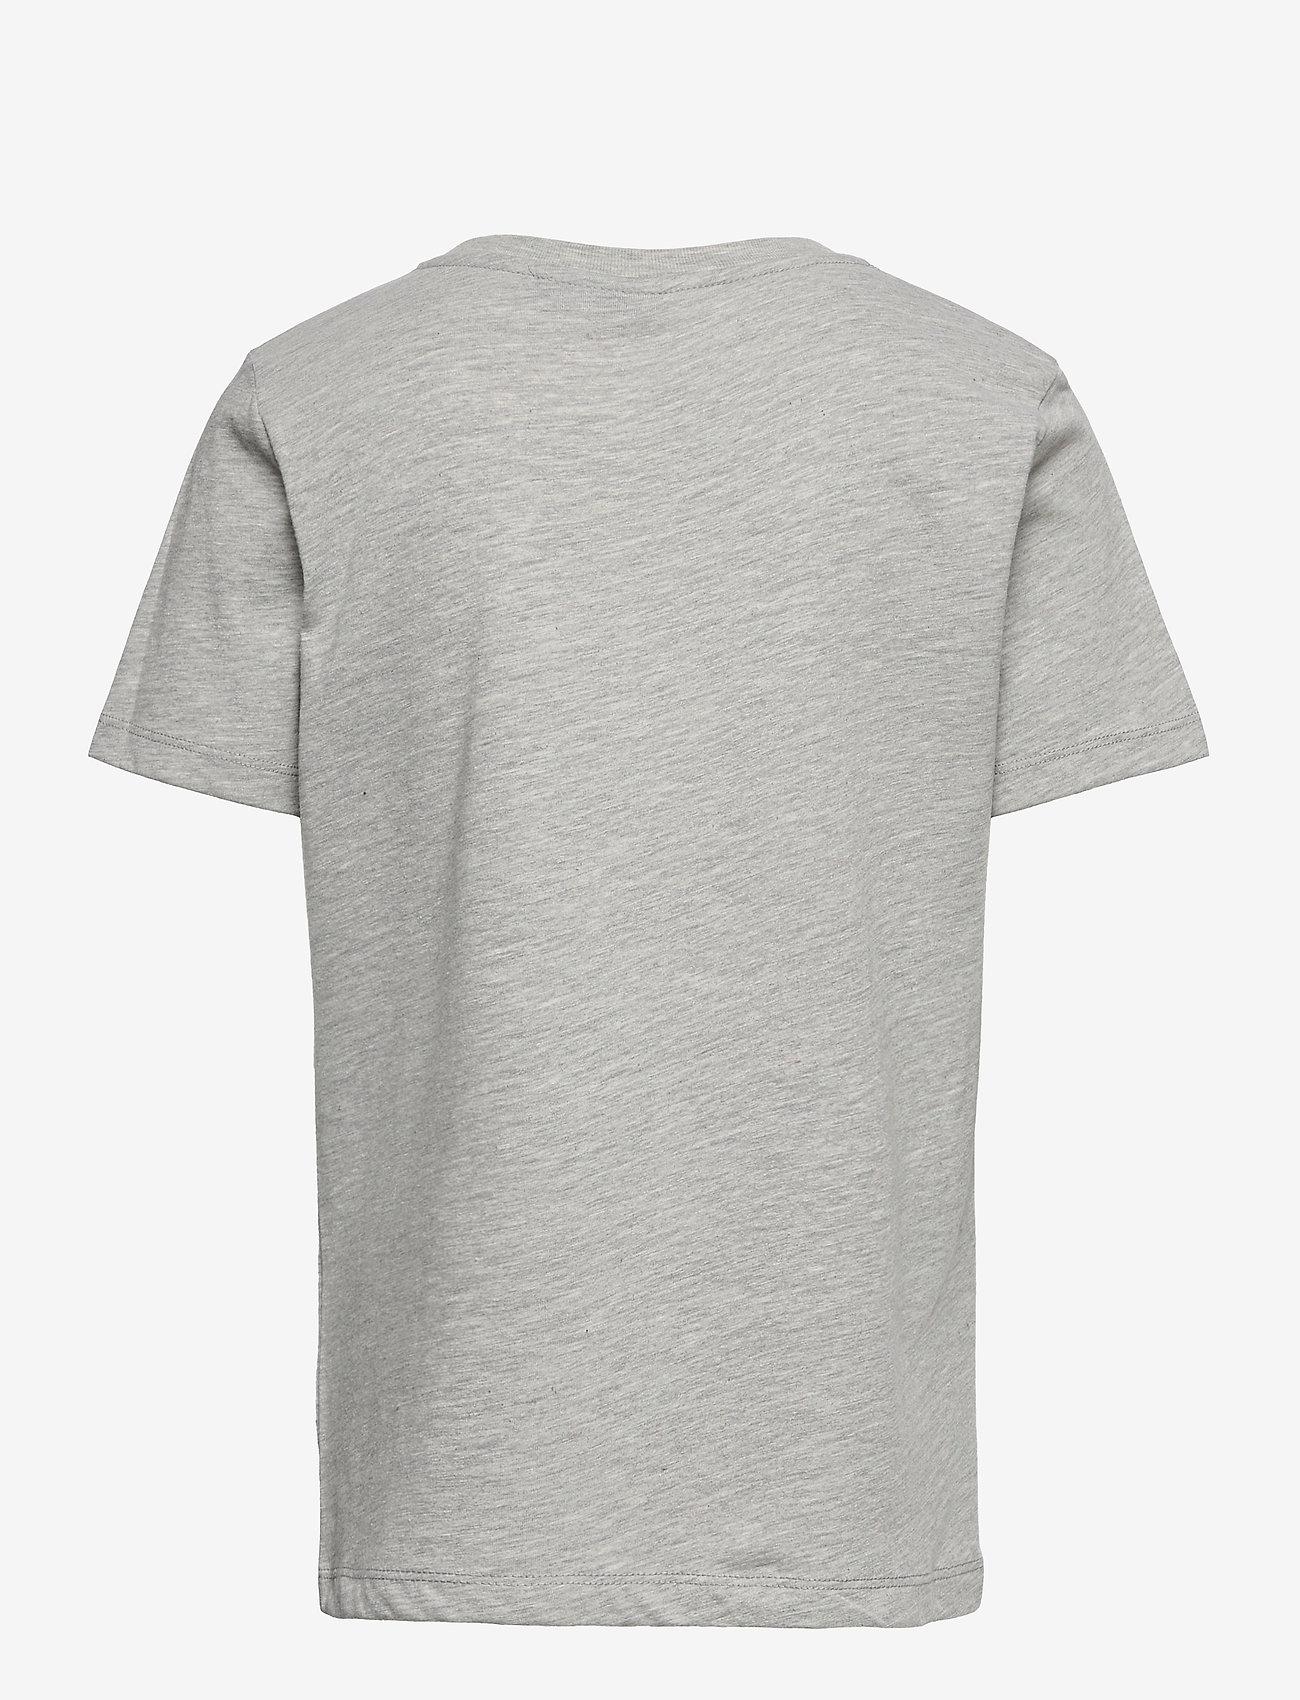 LMTD - NLMHYE SS R TOP BOX - t-shirts - light grey melange - 1